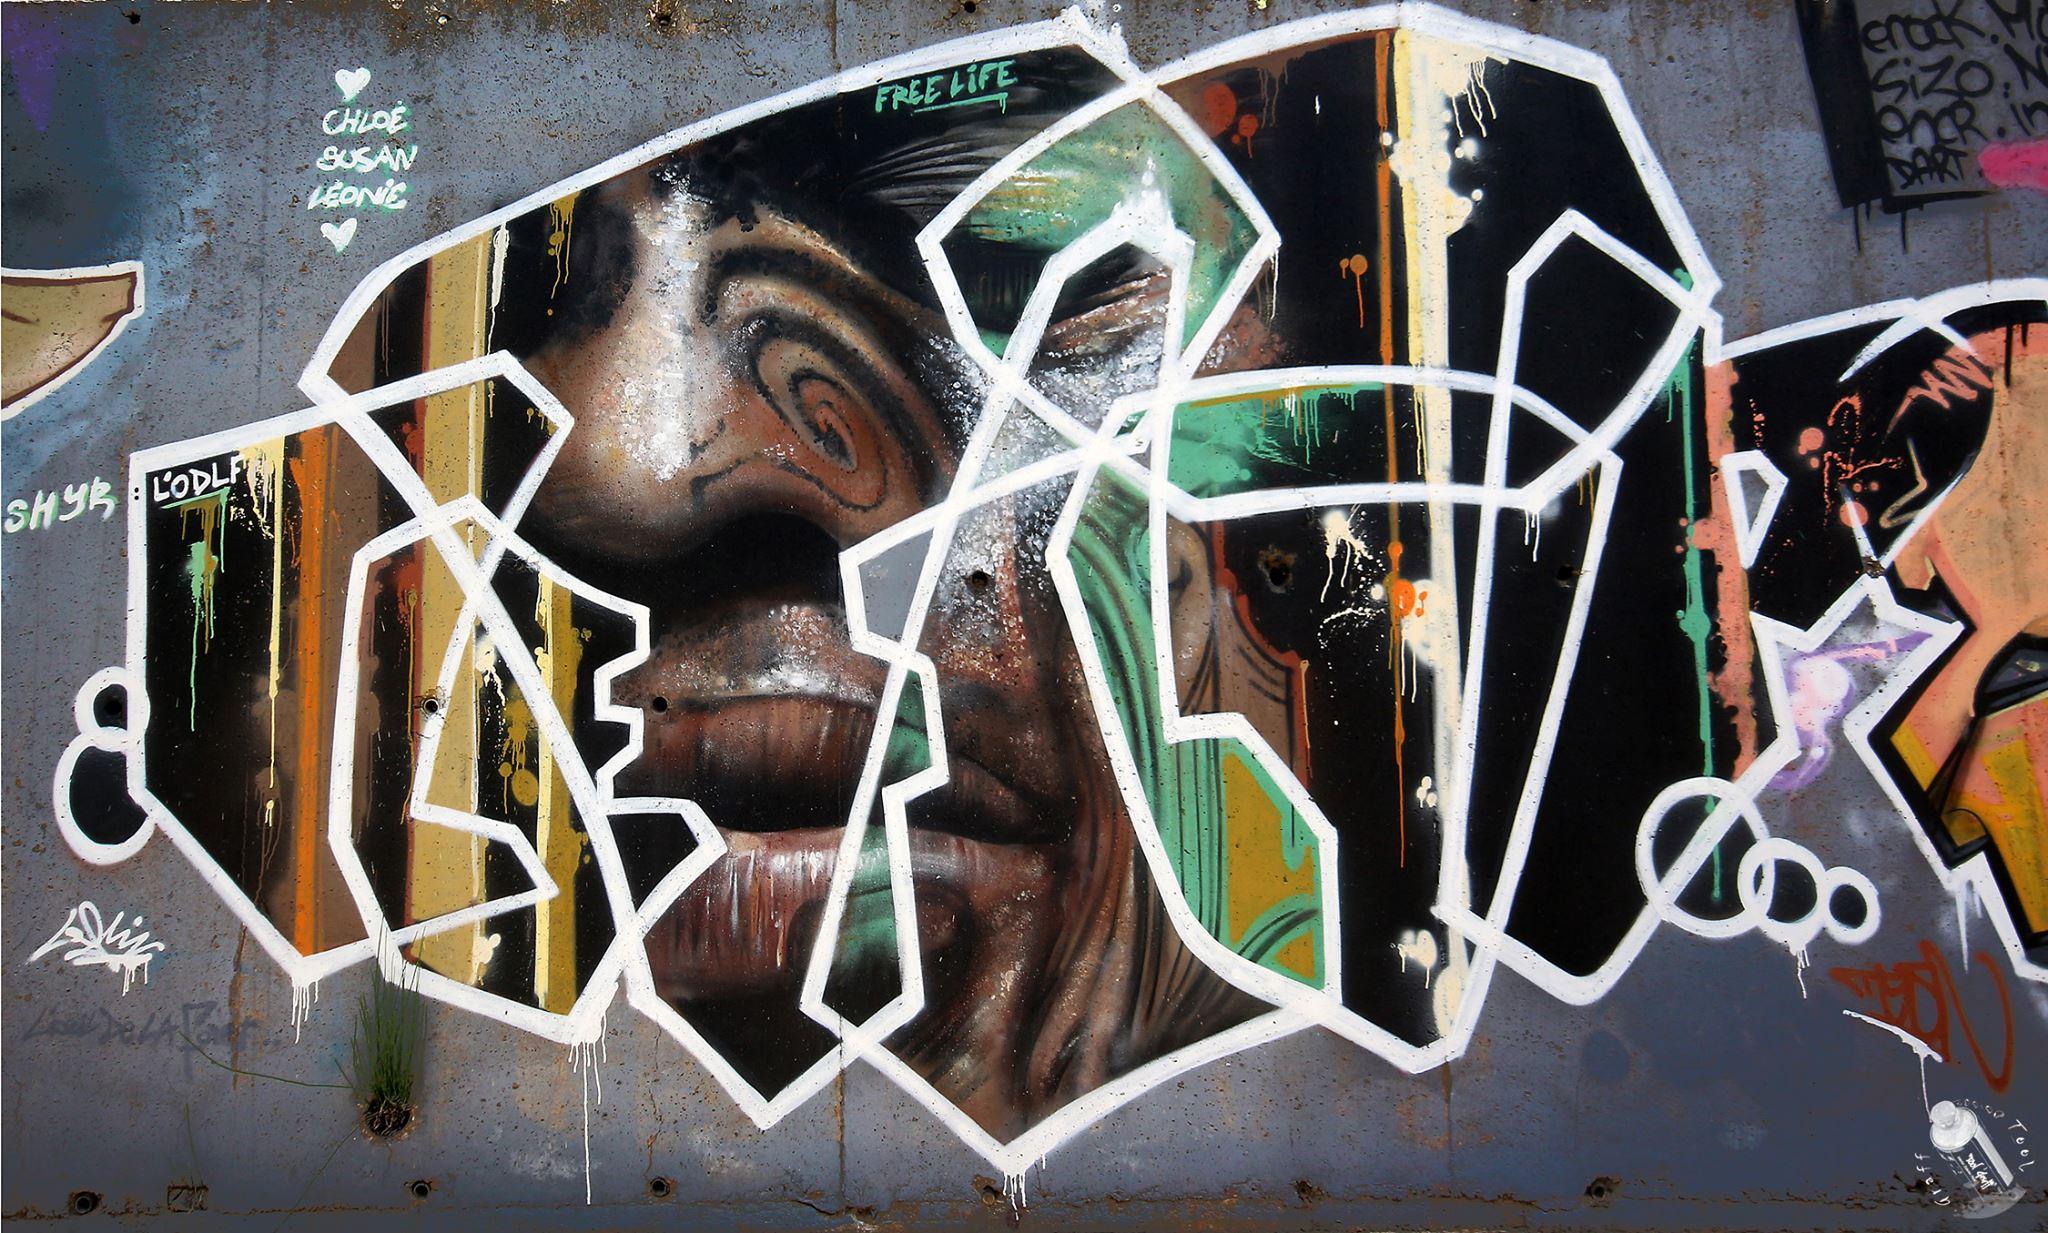 maori graffiti